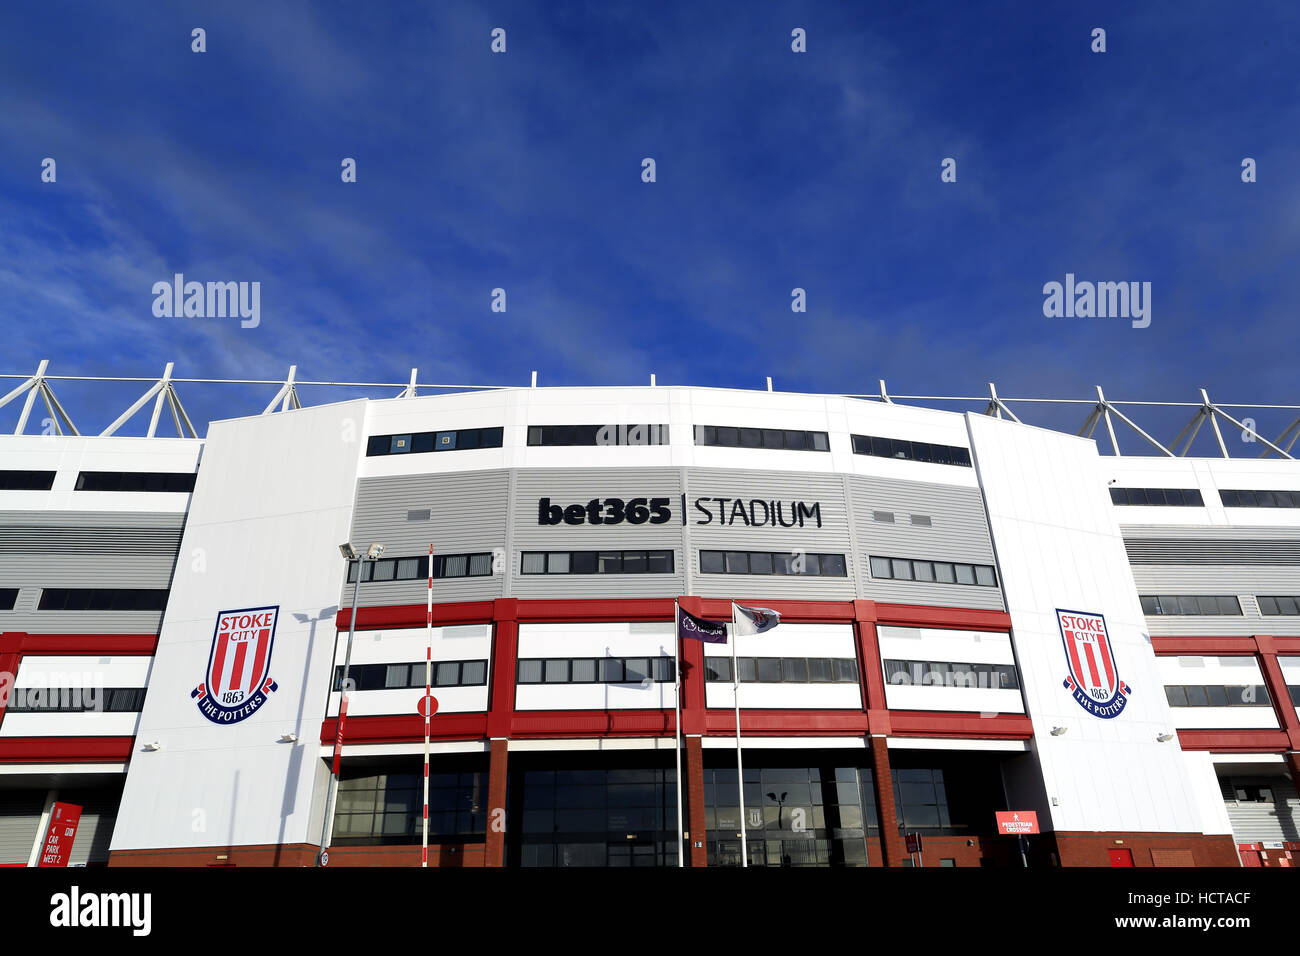 Bet 365 Stadium Stoke on Trent - home to Stoke City FC - Stock Image